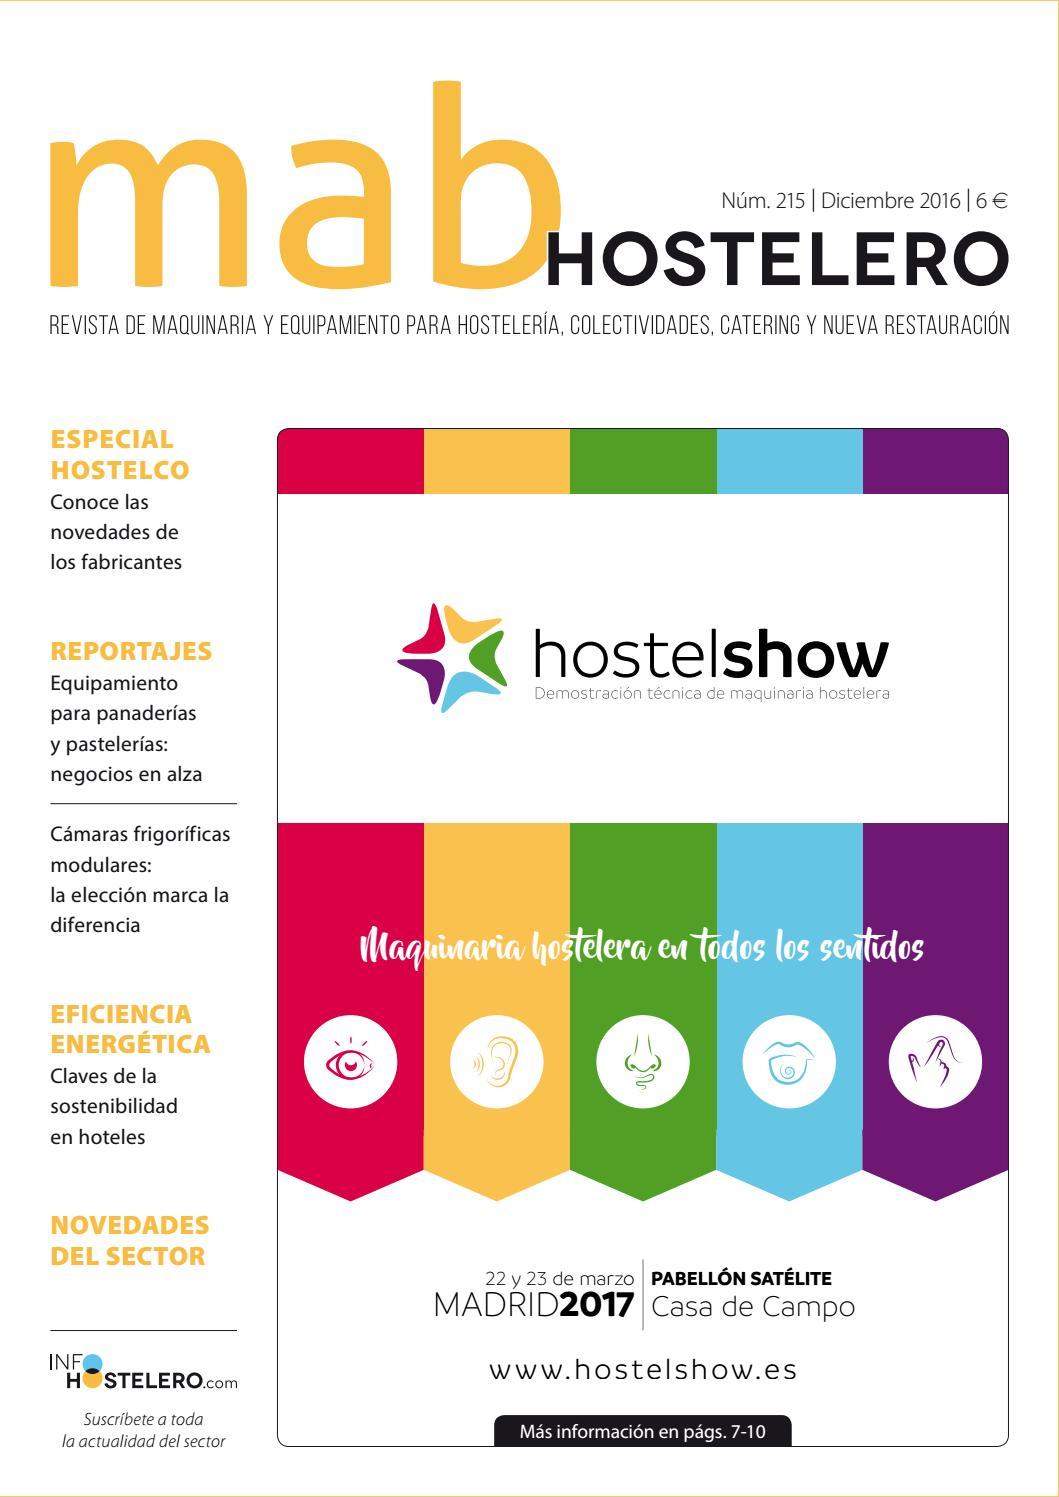 MAB Hostelero - 215 by Peldaño - issuu d4eeb98530e